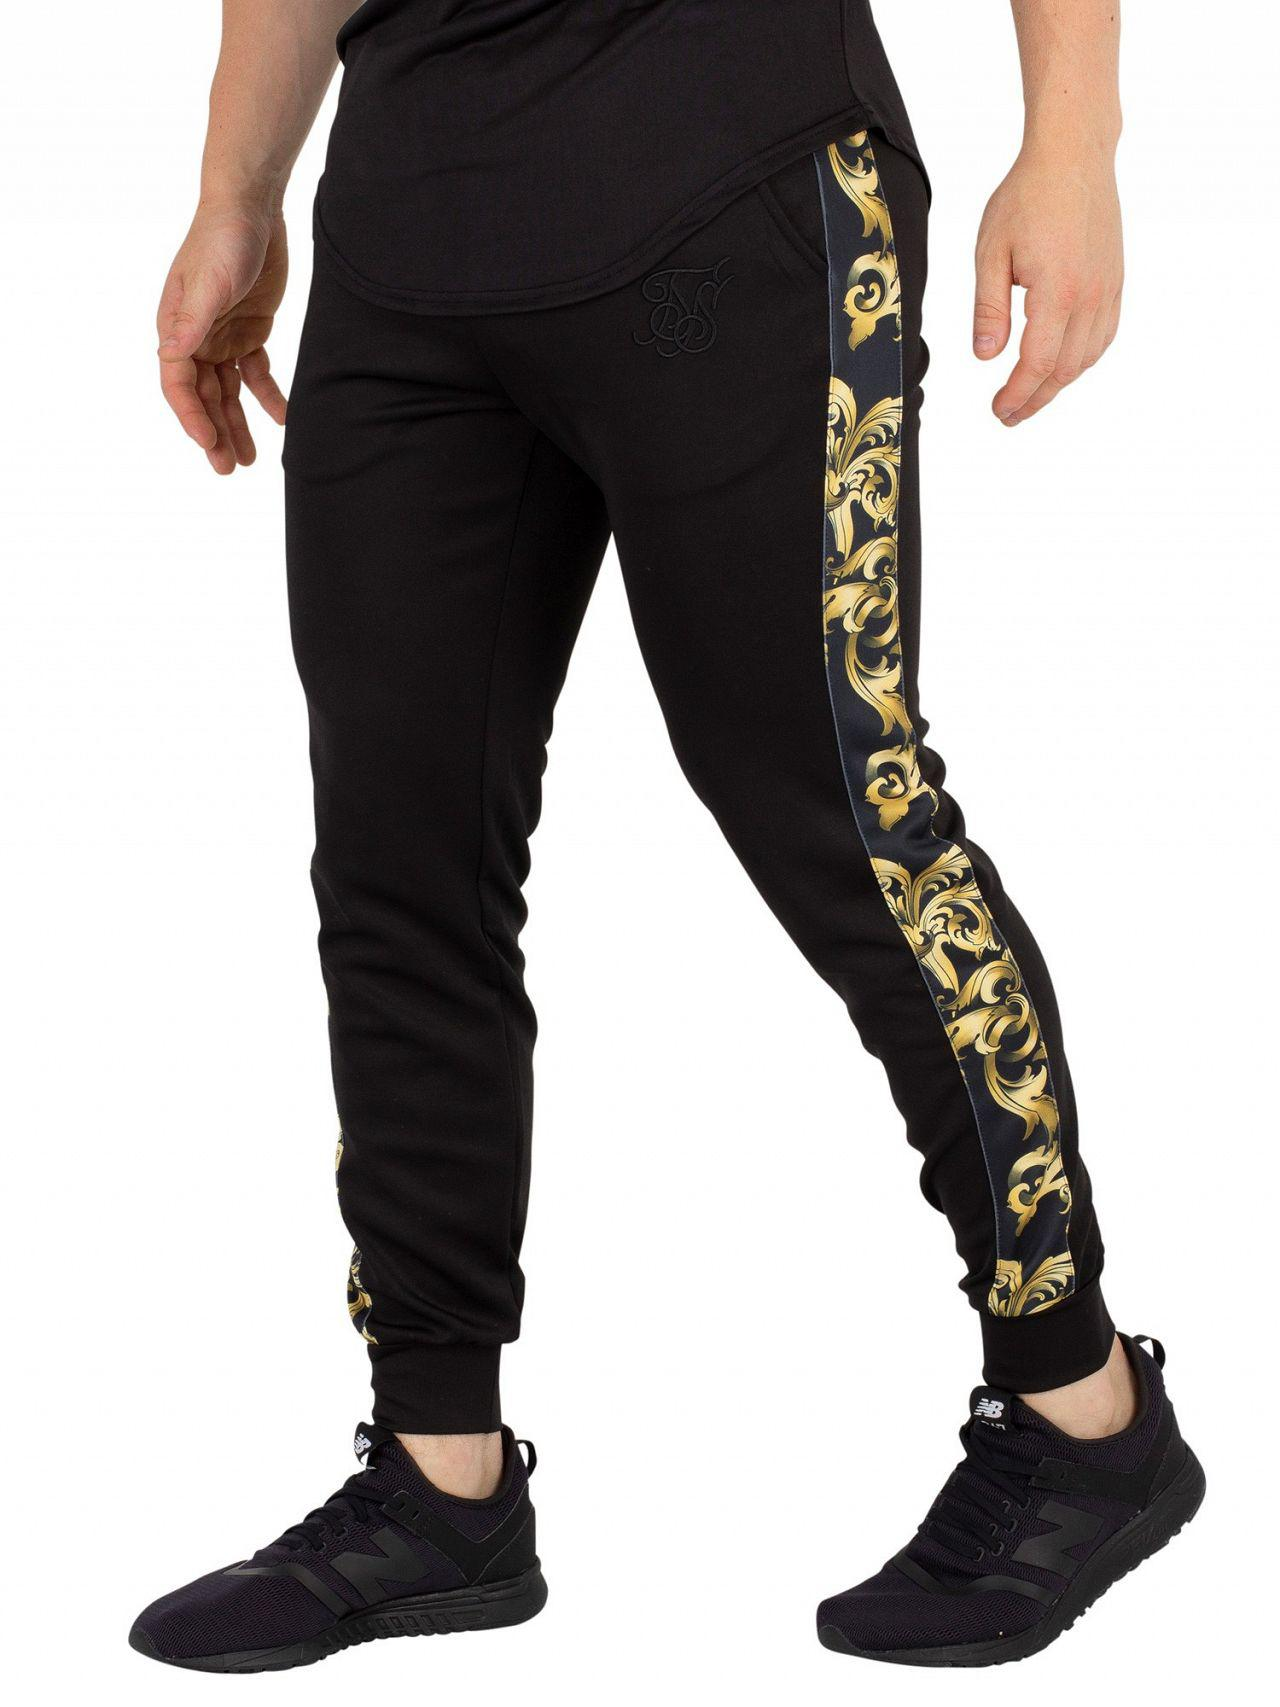 858e62c87b8b64 Sik Silk Black/gold Venetian Taped Cropped Joggers in Black for Men ...